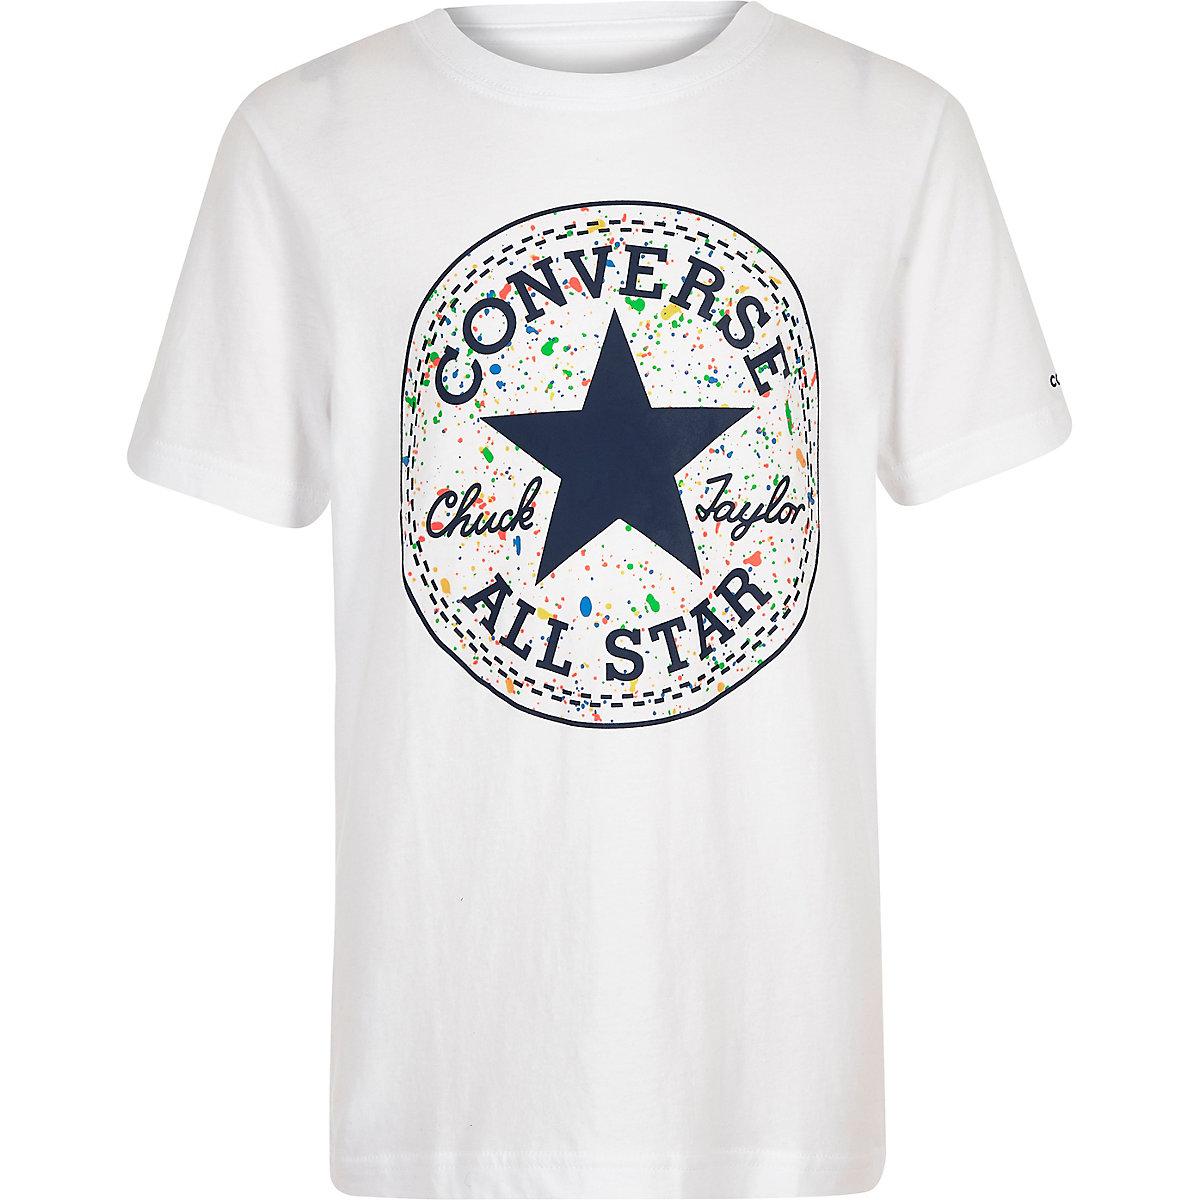 Boys white Converse splatter logo T-shirt